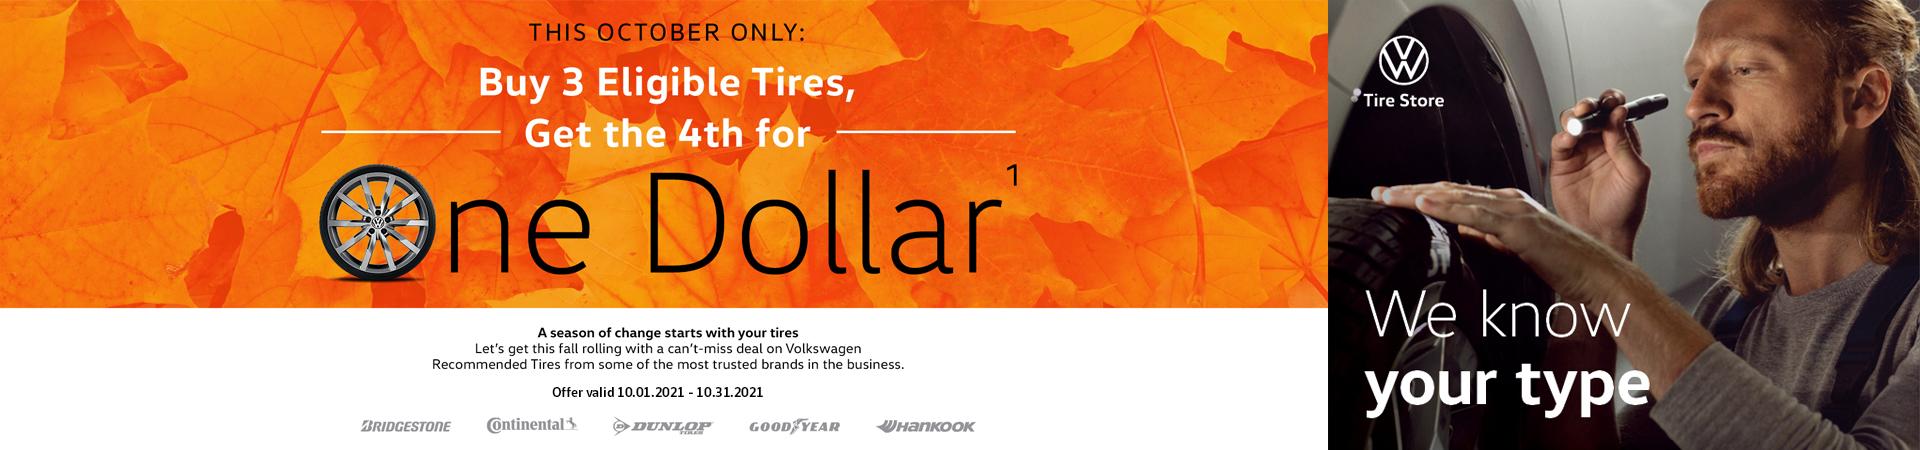 Tire offer